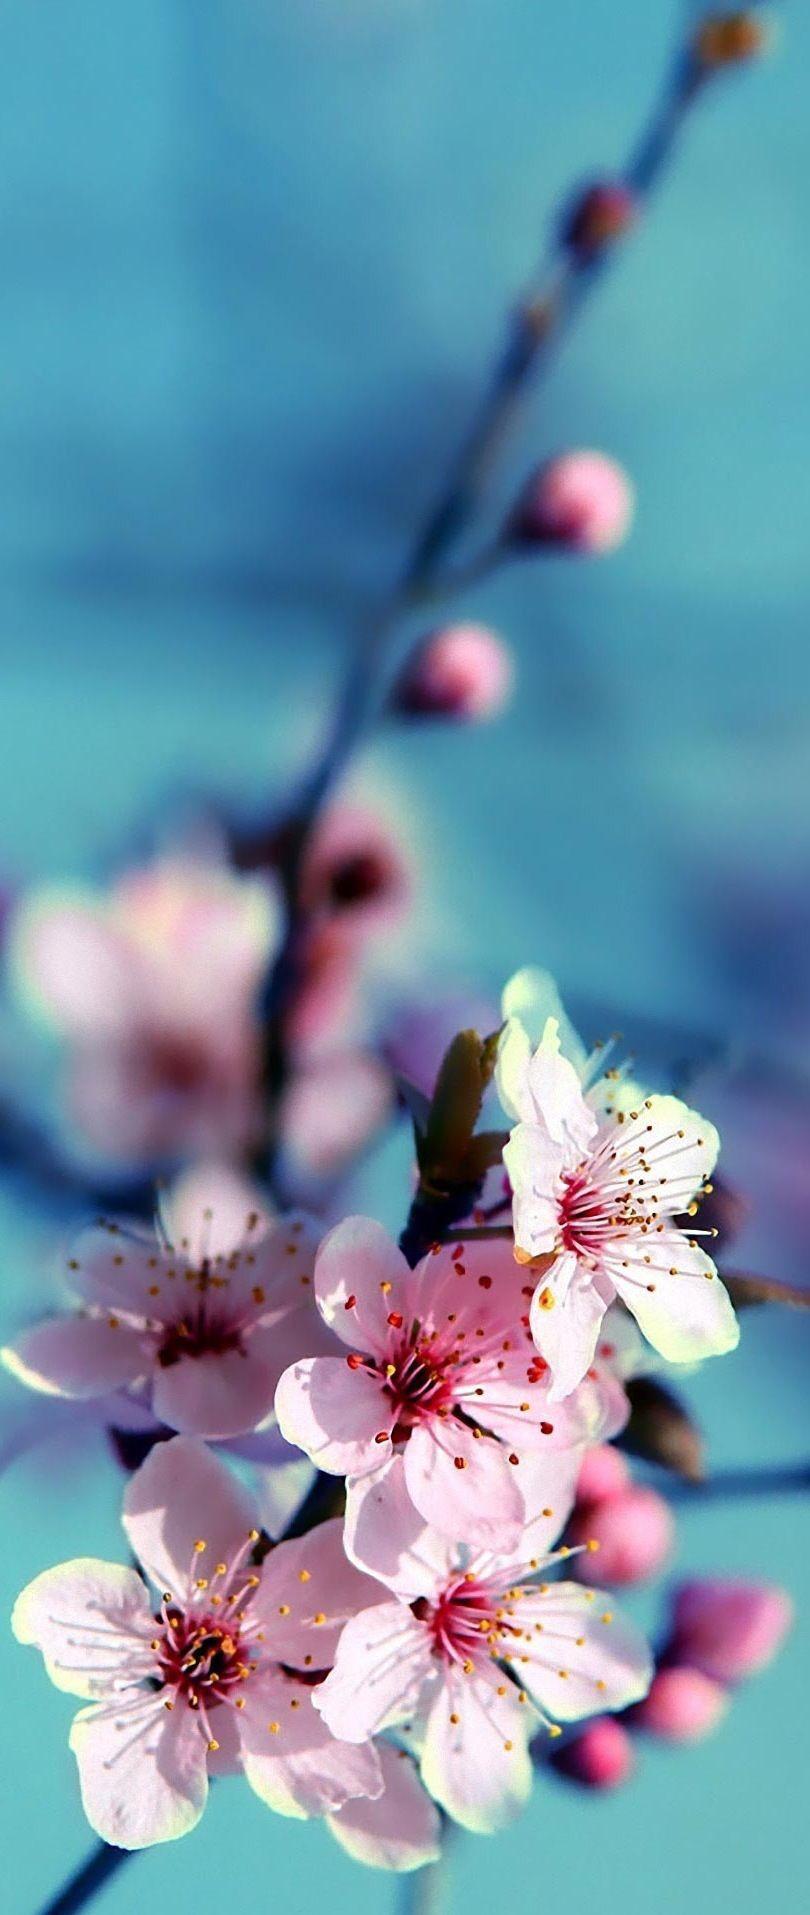 Pin By Eldra Wilsen On Flowers Japanese Cherry Blossom Cherry Blossom Festival Pretty Flowers